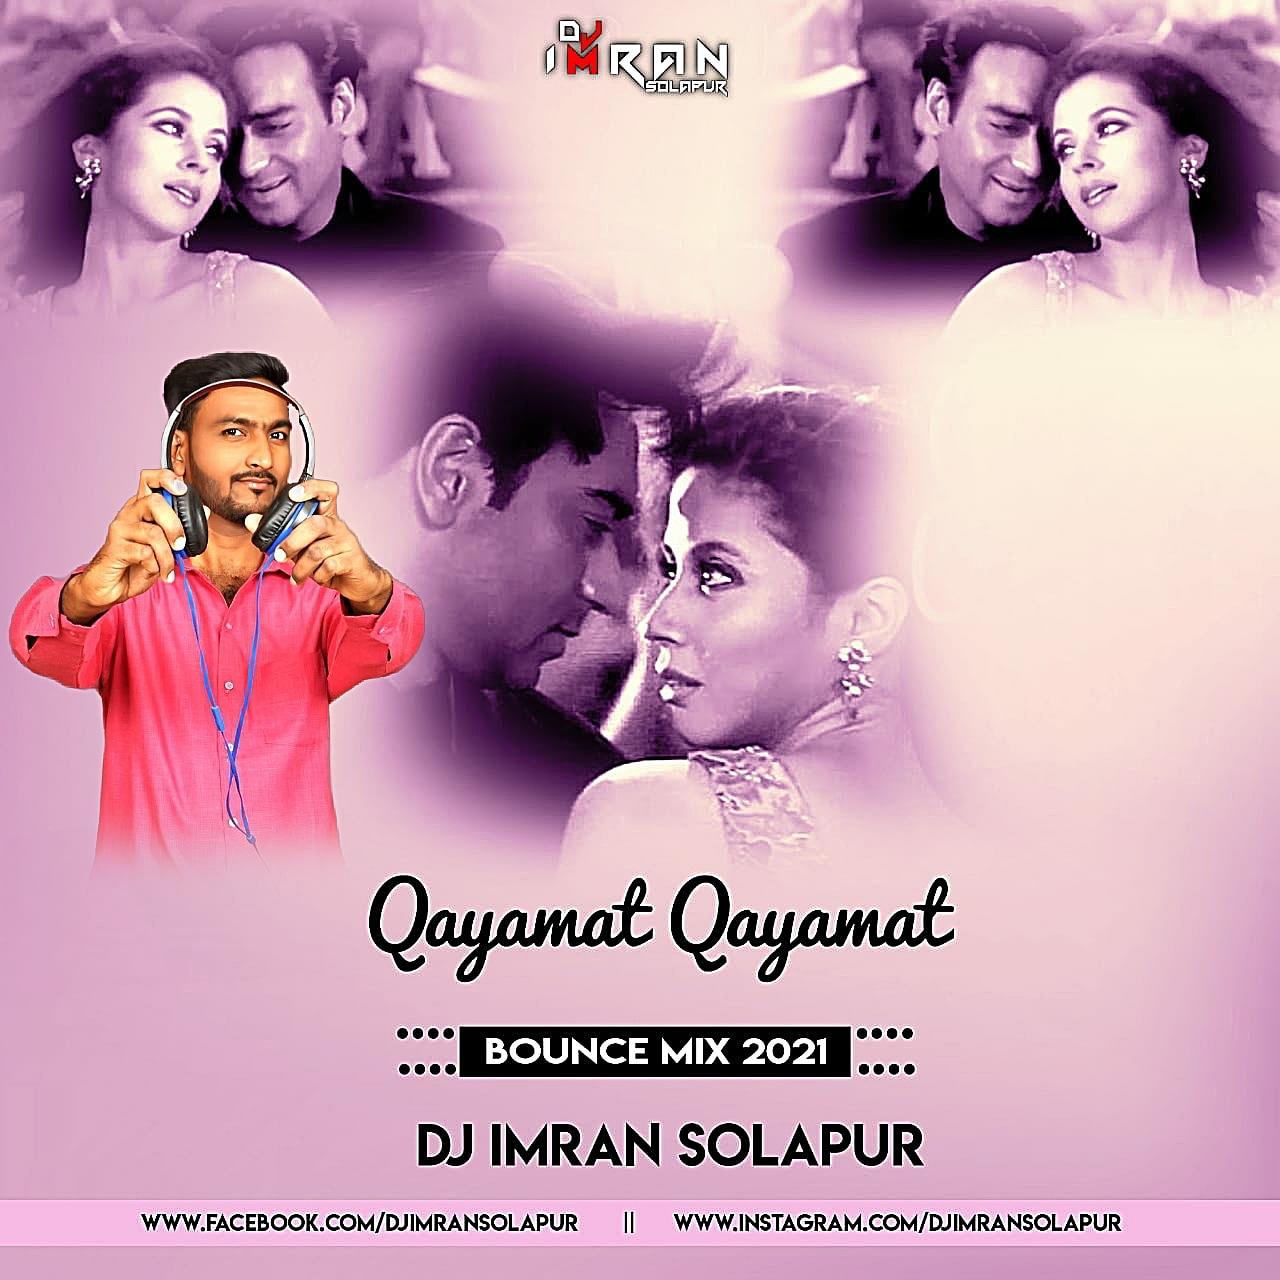 Qayamat Qayamat (2000) Bounce Mix 2021 - DJ Imran Solapur